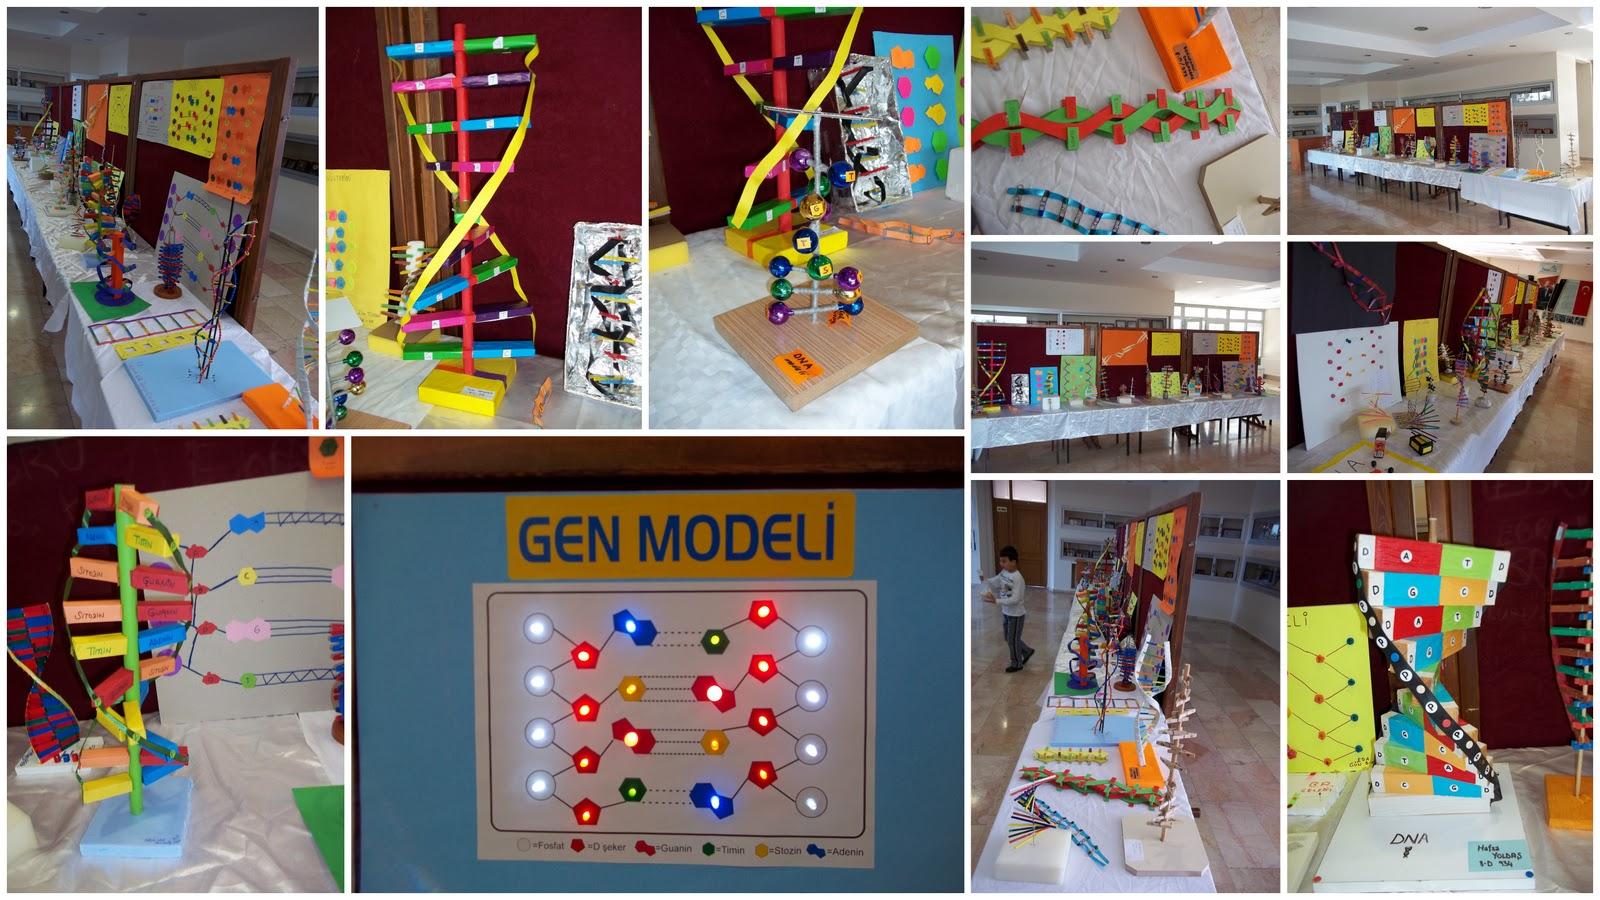 DNA modeli yar��mas�